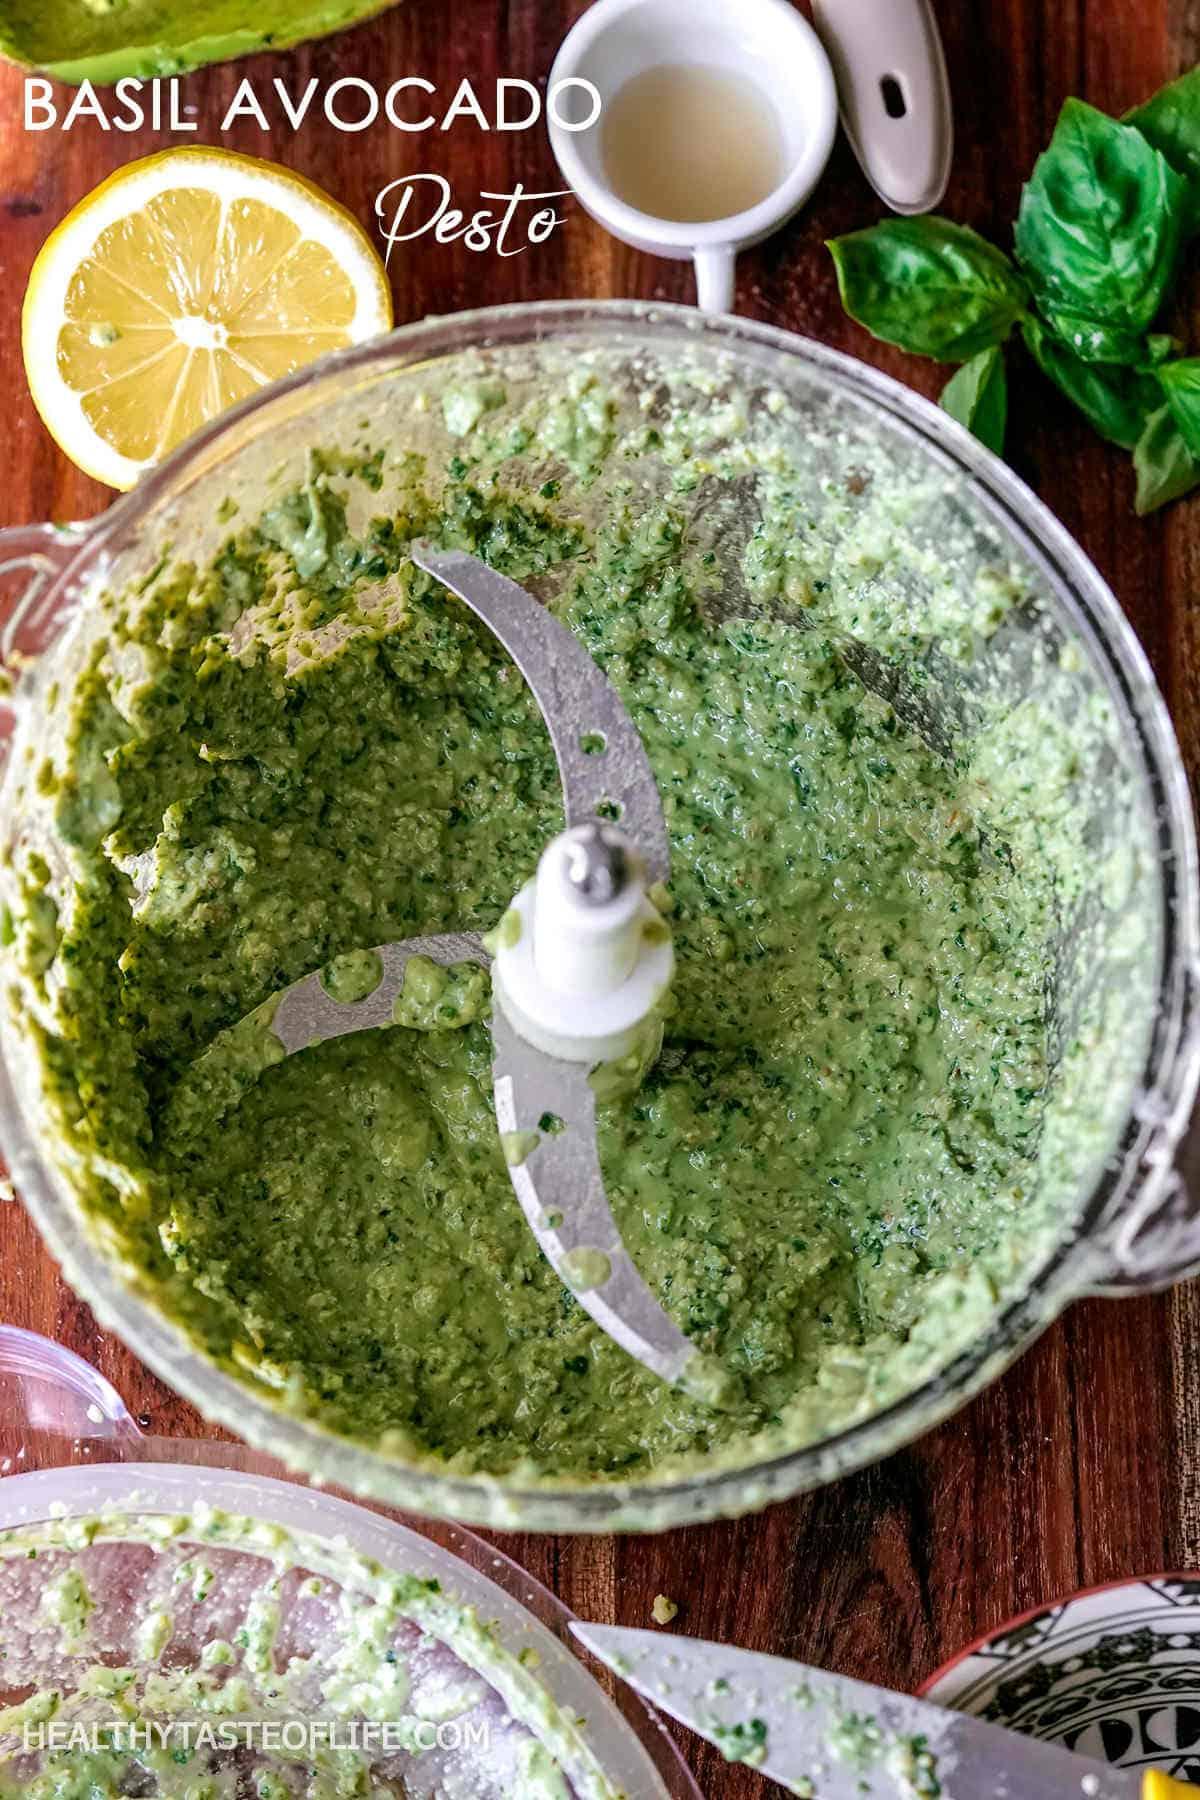 Homemade Healthy Vegan Basil Pesto Recipe with avocado, walnuts, parsley, lemon, garlic, maple syrup and sea salt.